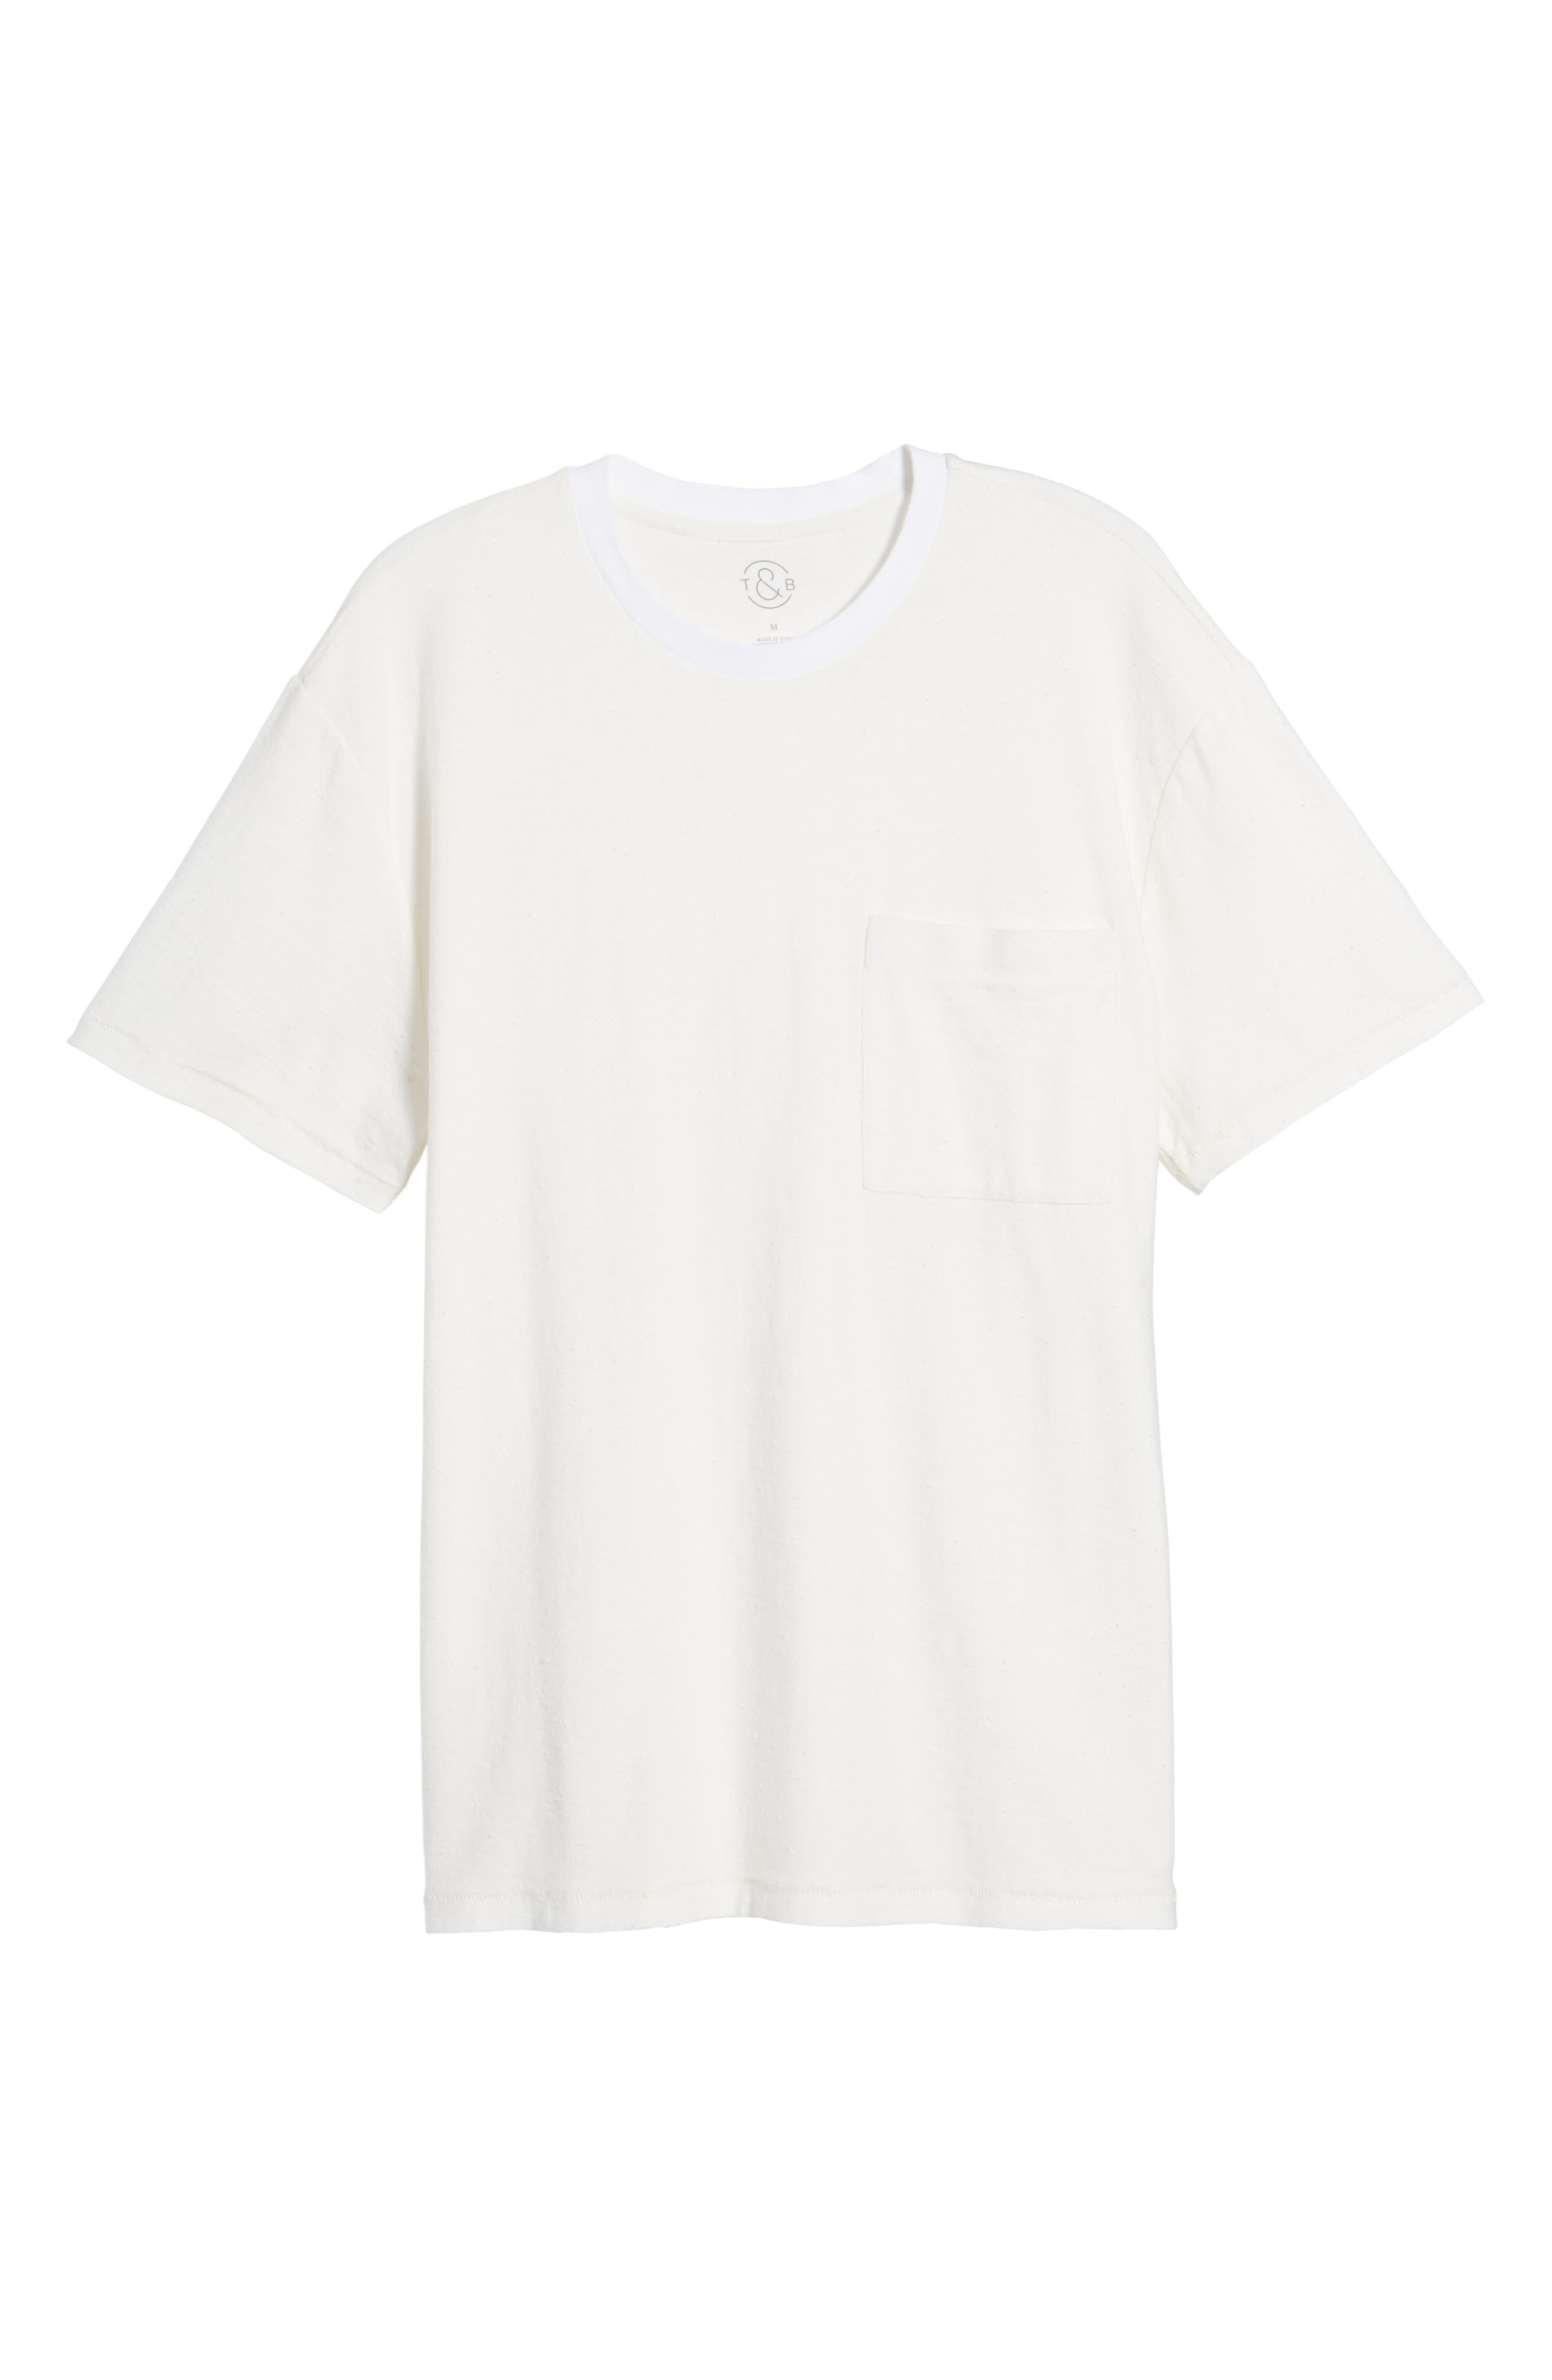 Nep Cotton Pocket T-Shirt,                             Alternate thumbnail 12, color,